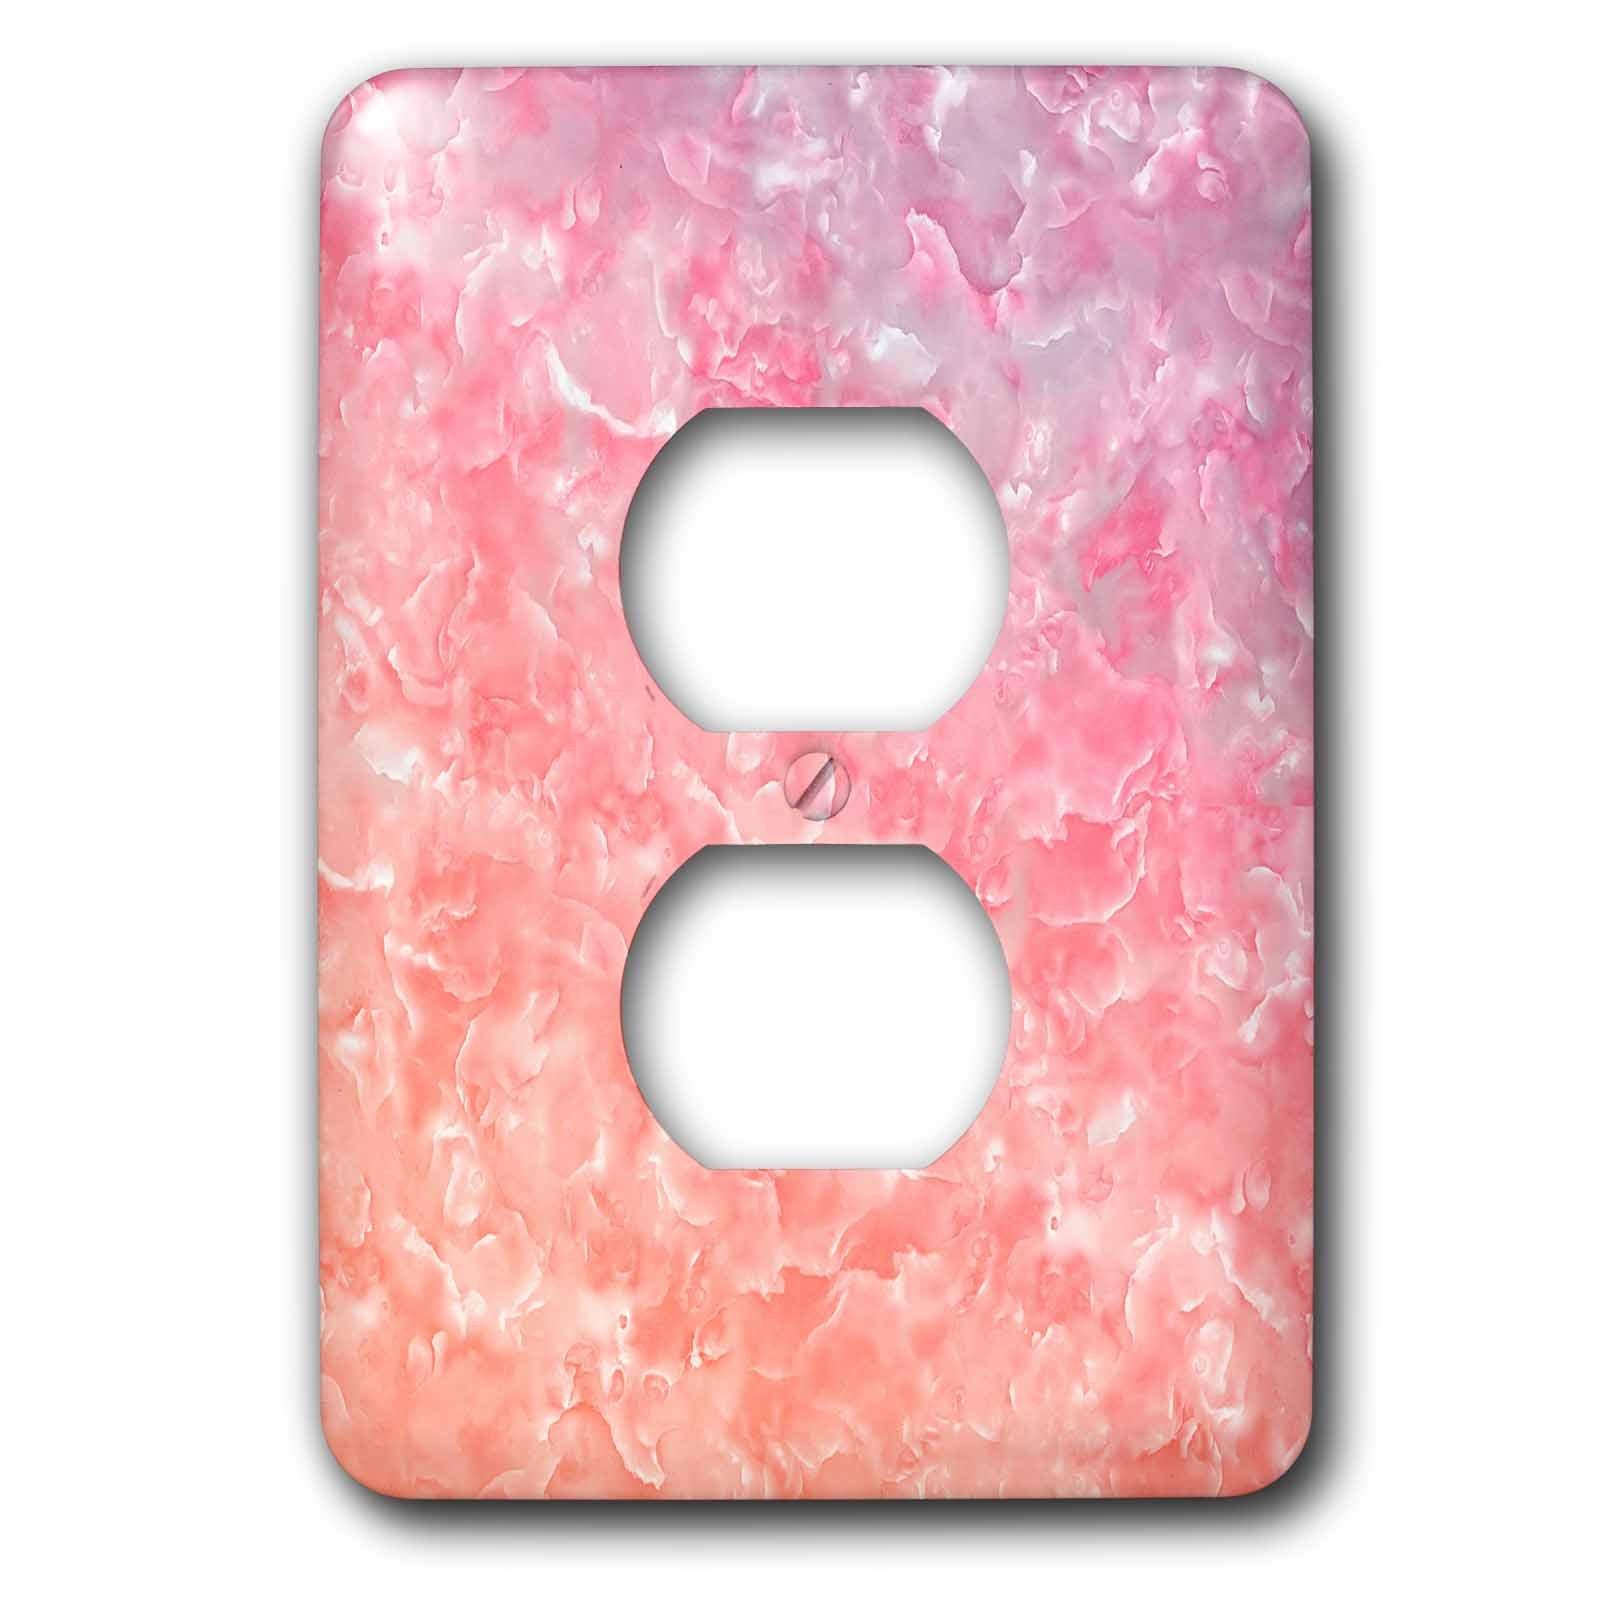 3dRose Uta Naumann Faux Glitter Pattern - Image of Trendy Luxury Dark Rose Quartz Pink Gemstone Agate Geode - Light Switch Covers - 2 plug outlet cover (lsp_275122_6)